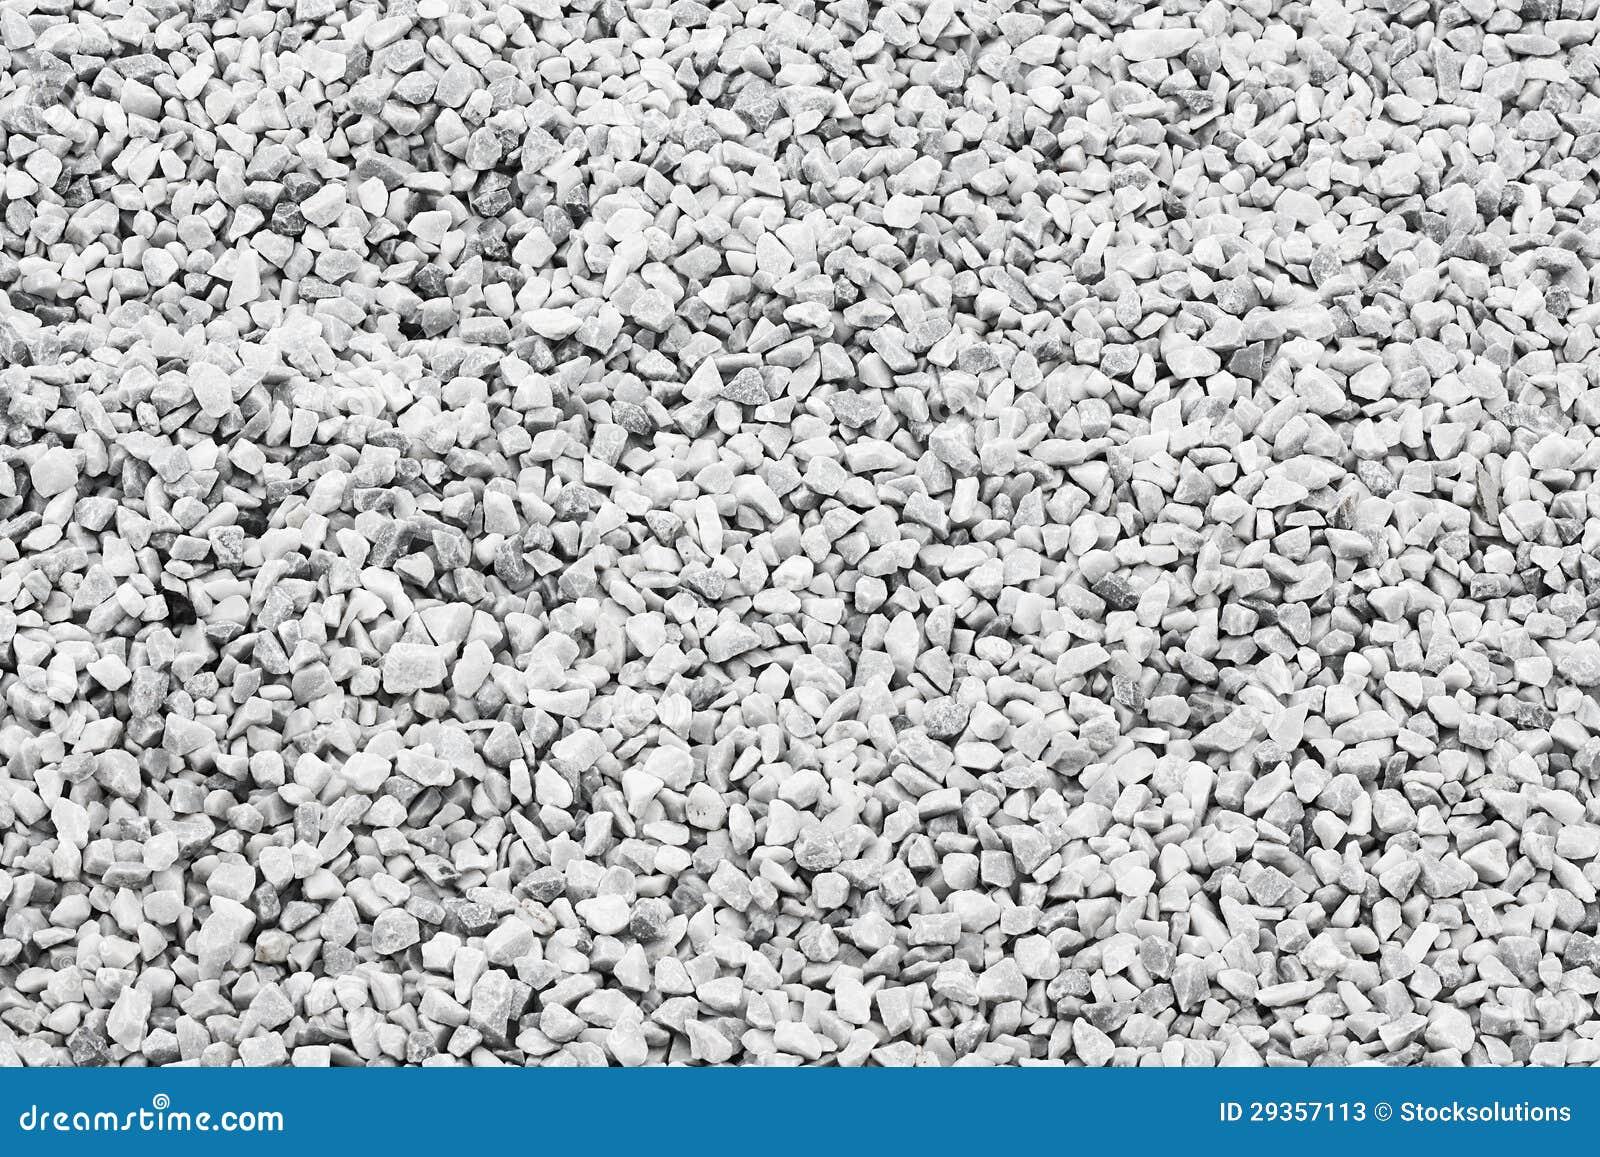 White quartz stone decorative chippings or aggregates